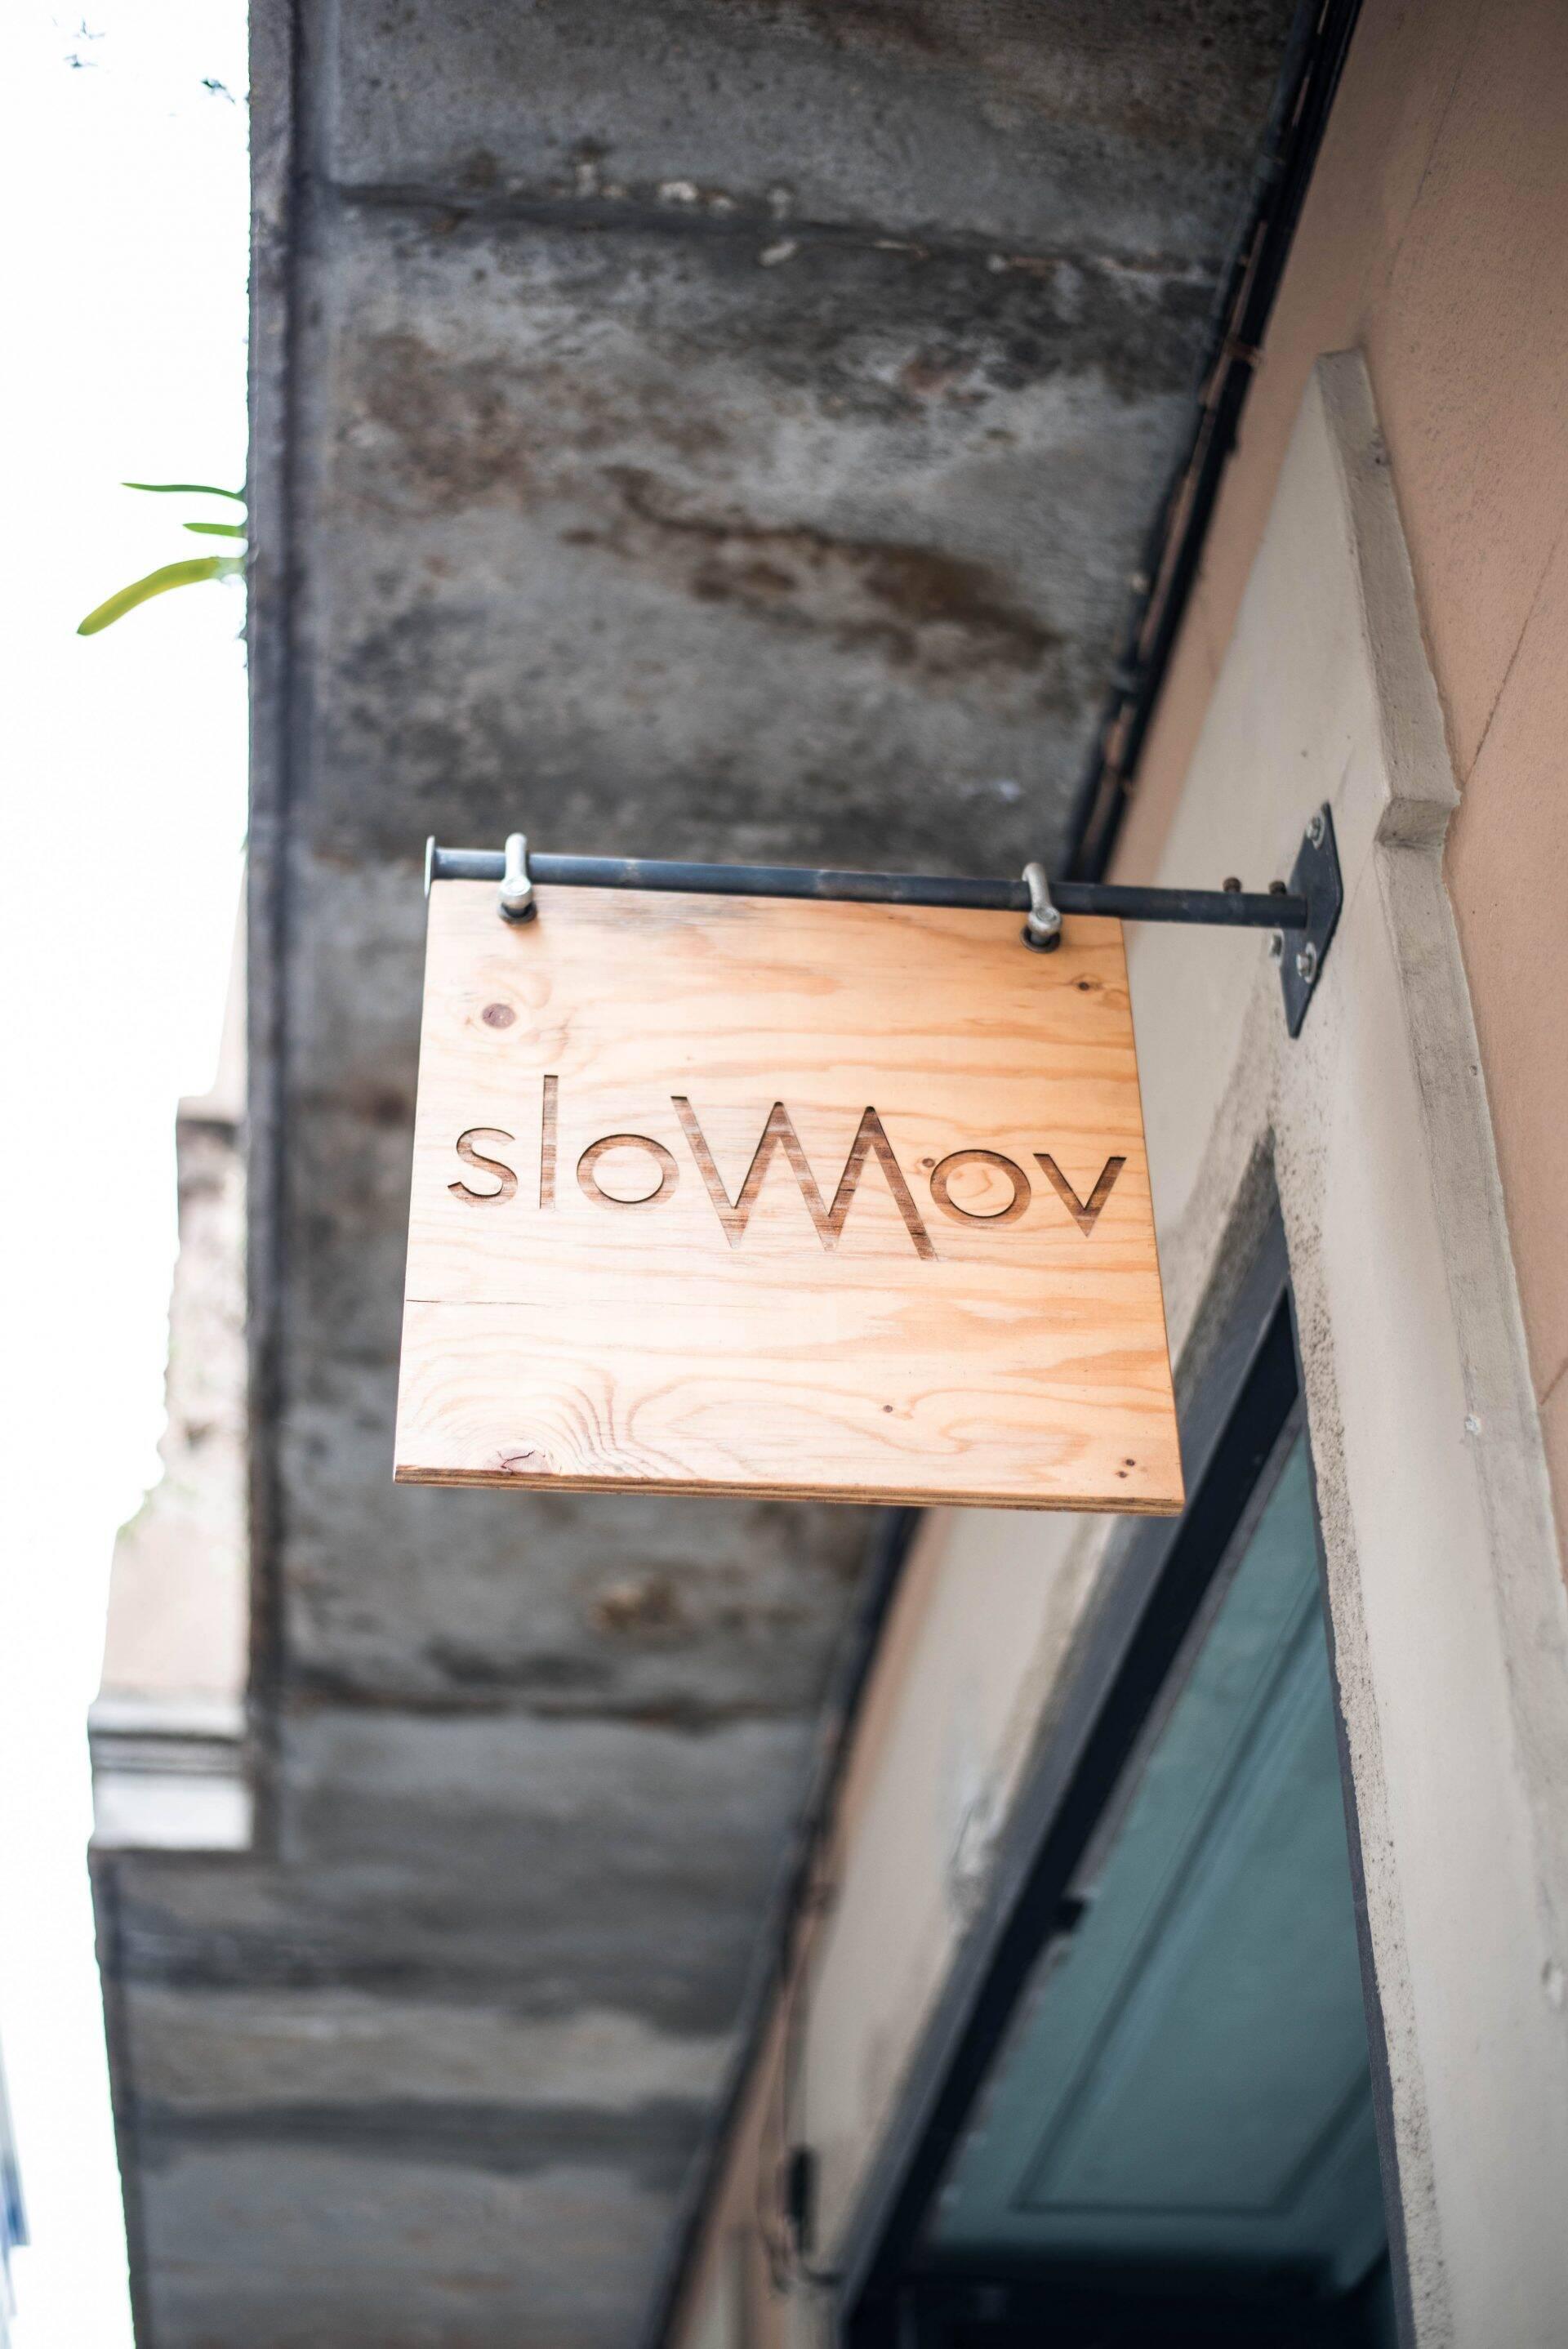 SlowMov in Barcelona